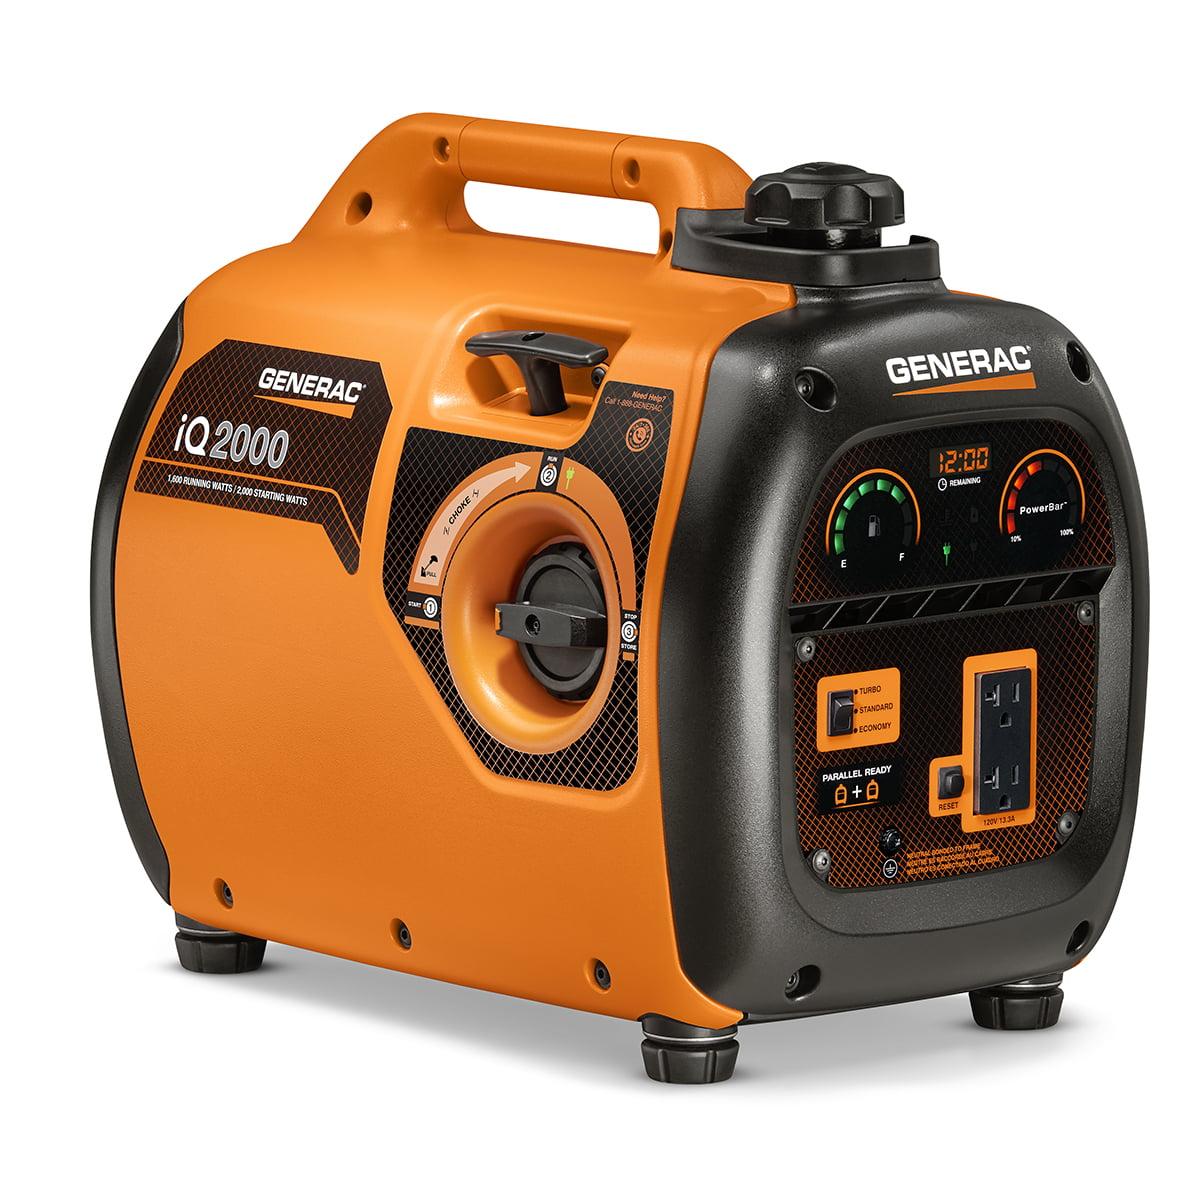 Generac 6866 iQ2000 2000 Watt Inverter Portable Generator, 50 State/CARB